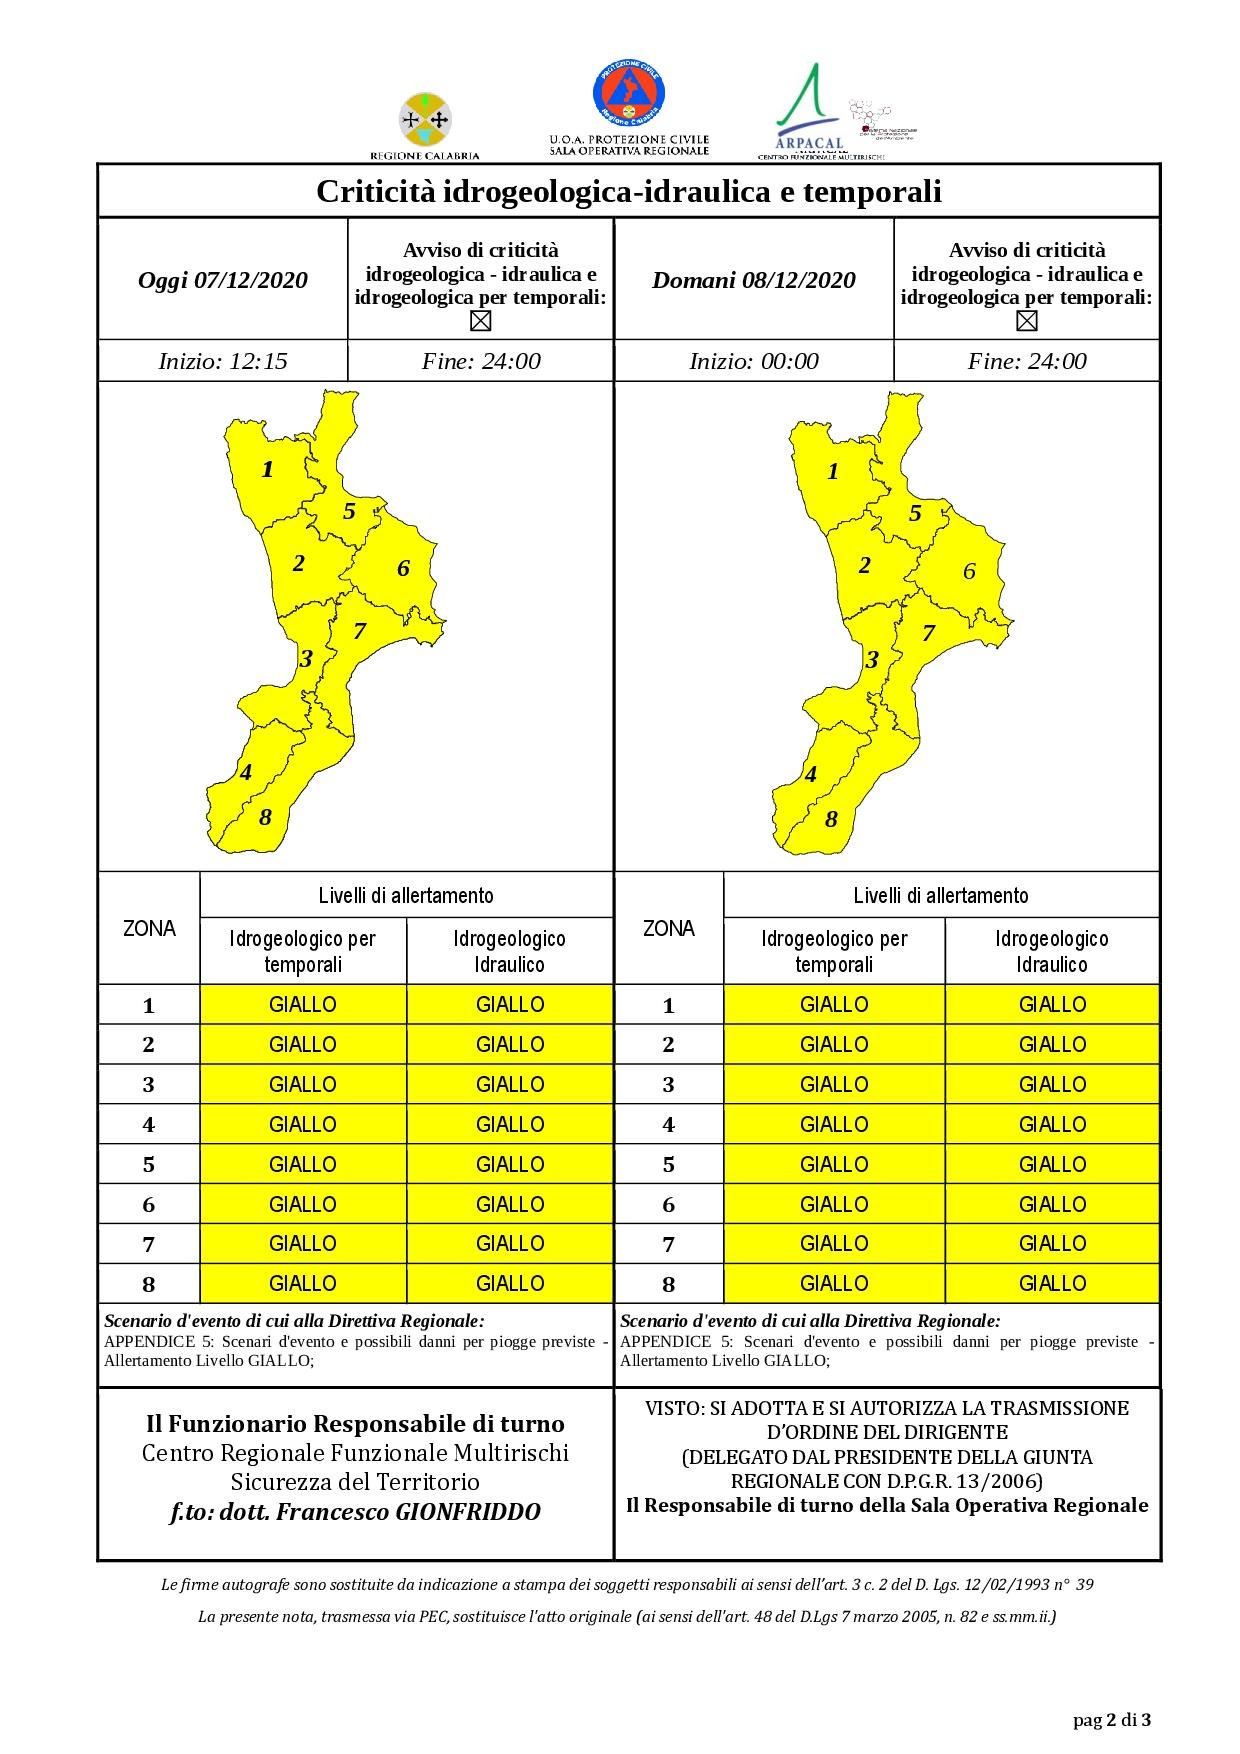 Criticità idrogeologica-idraulica e temporali in Calabria 07-12-2020